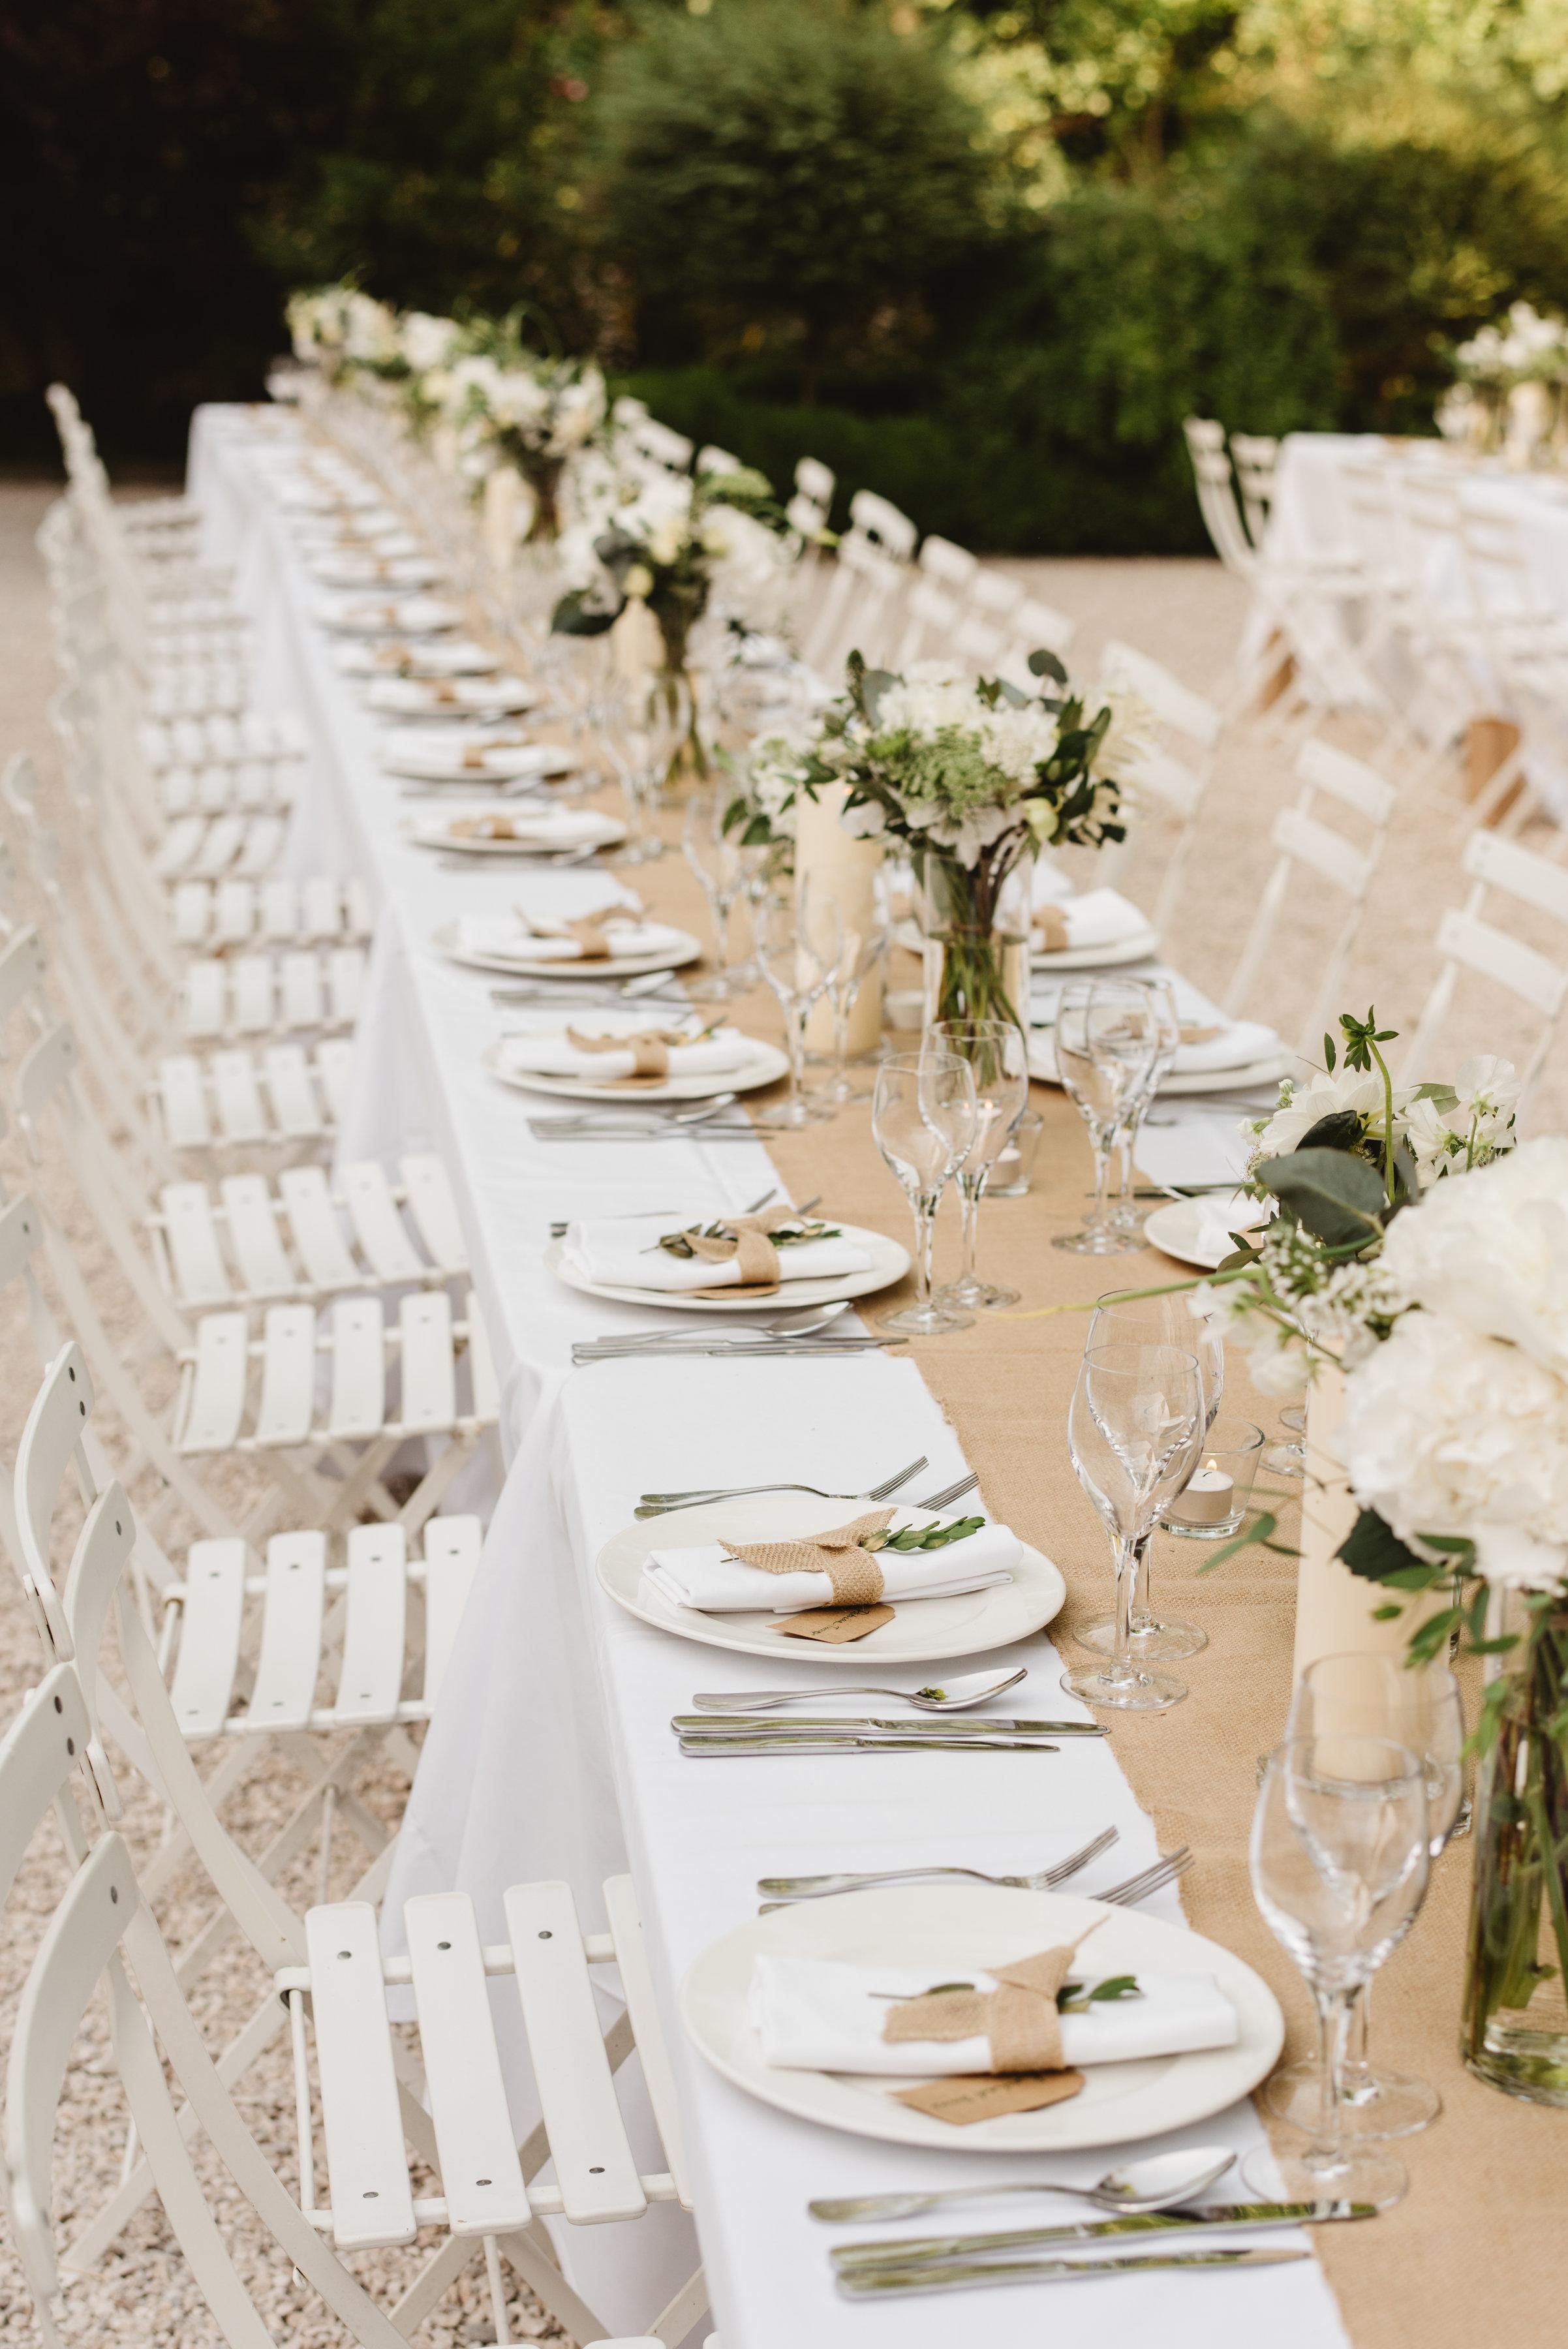 Chateau wedding saying